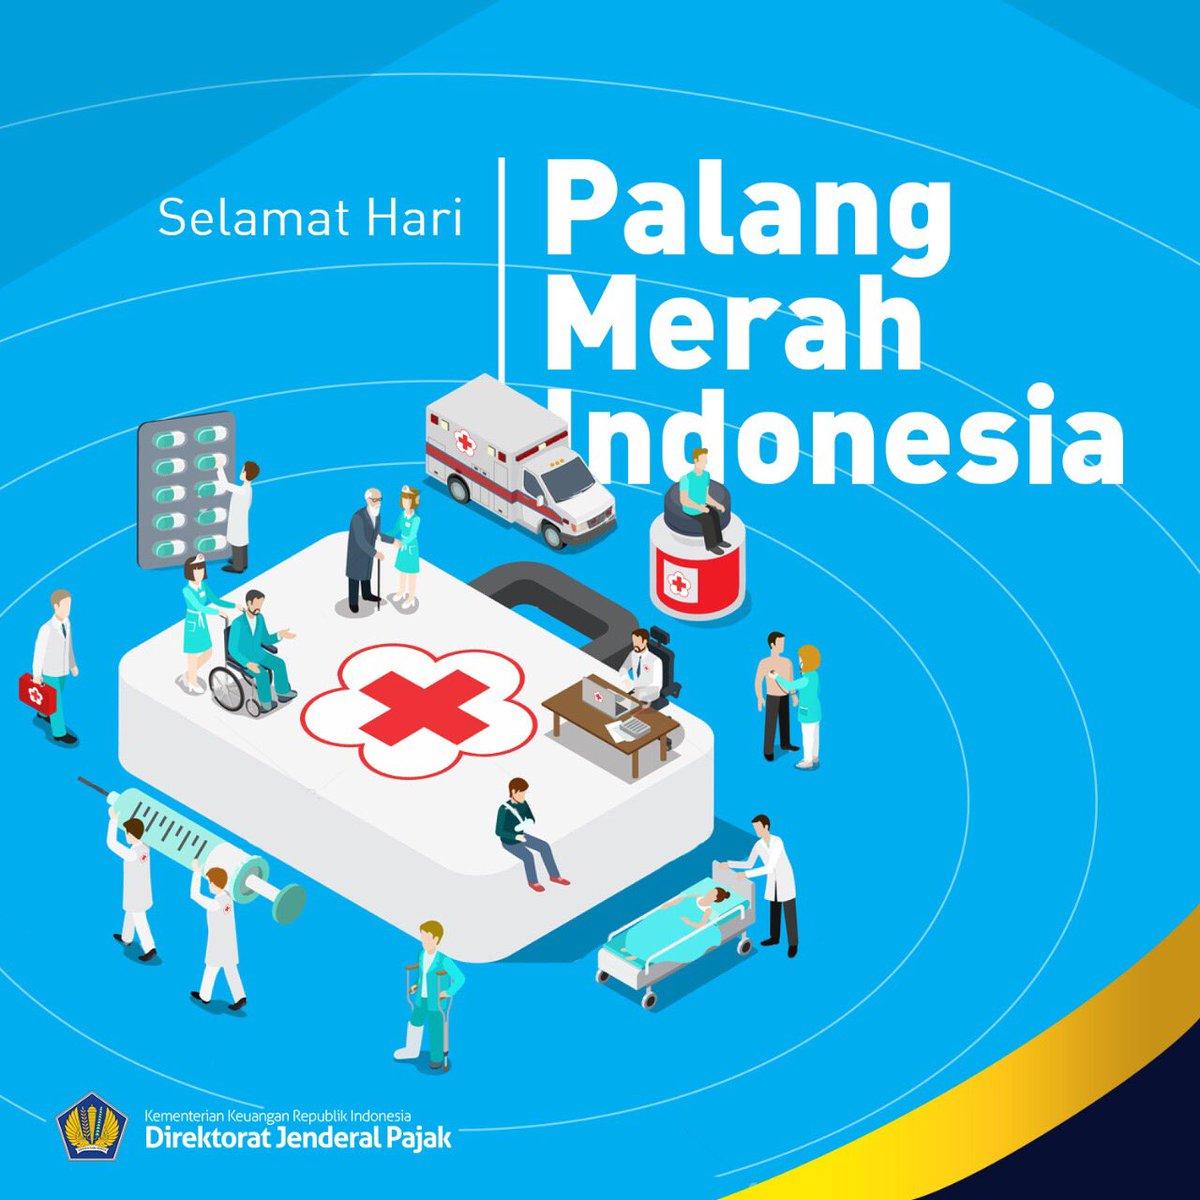 Palang Merah Indonesia